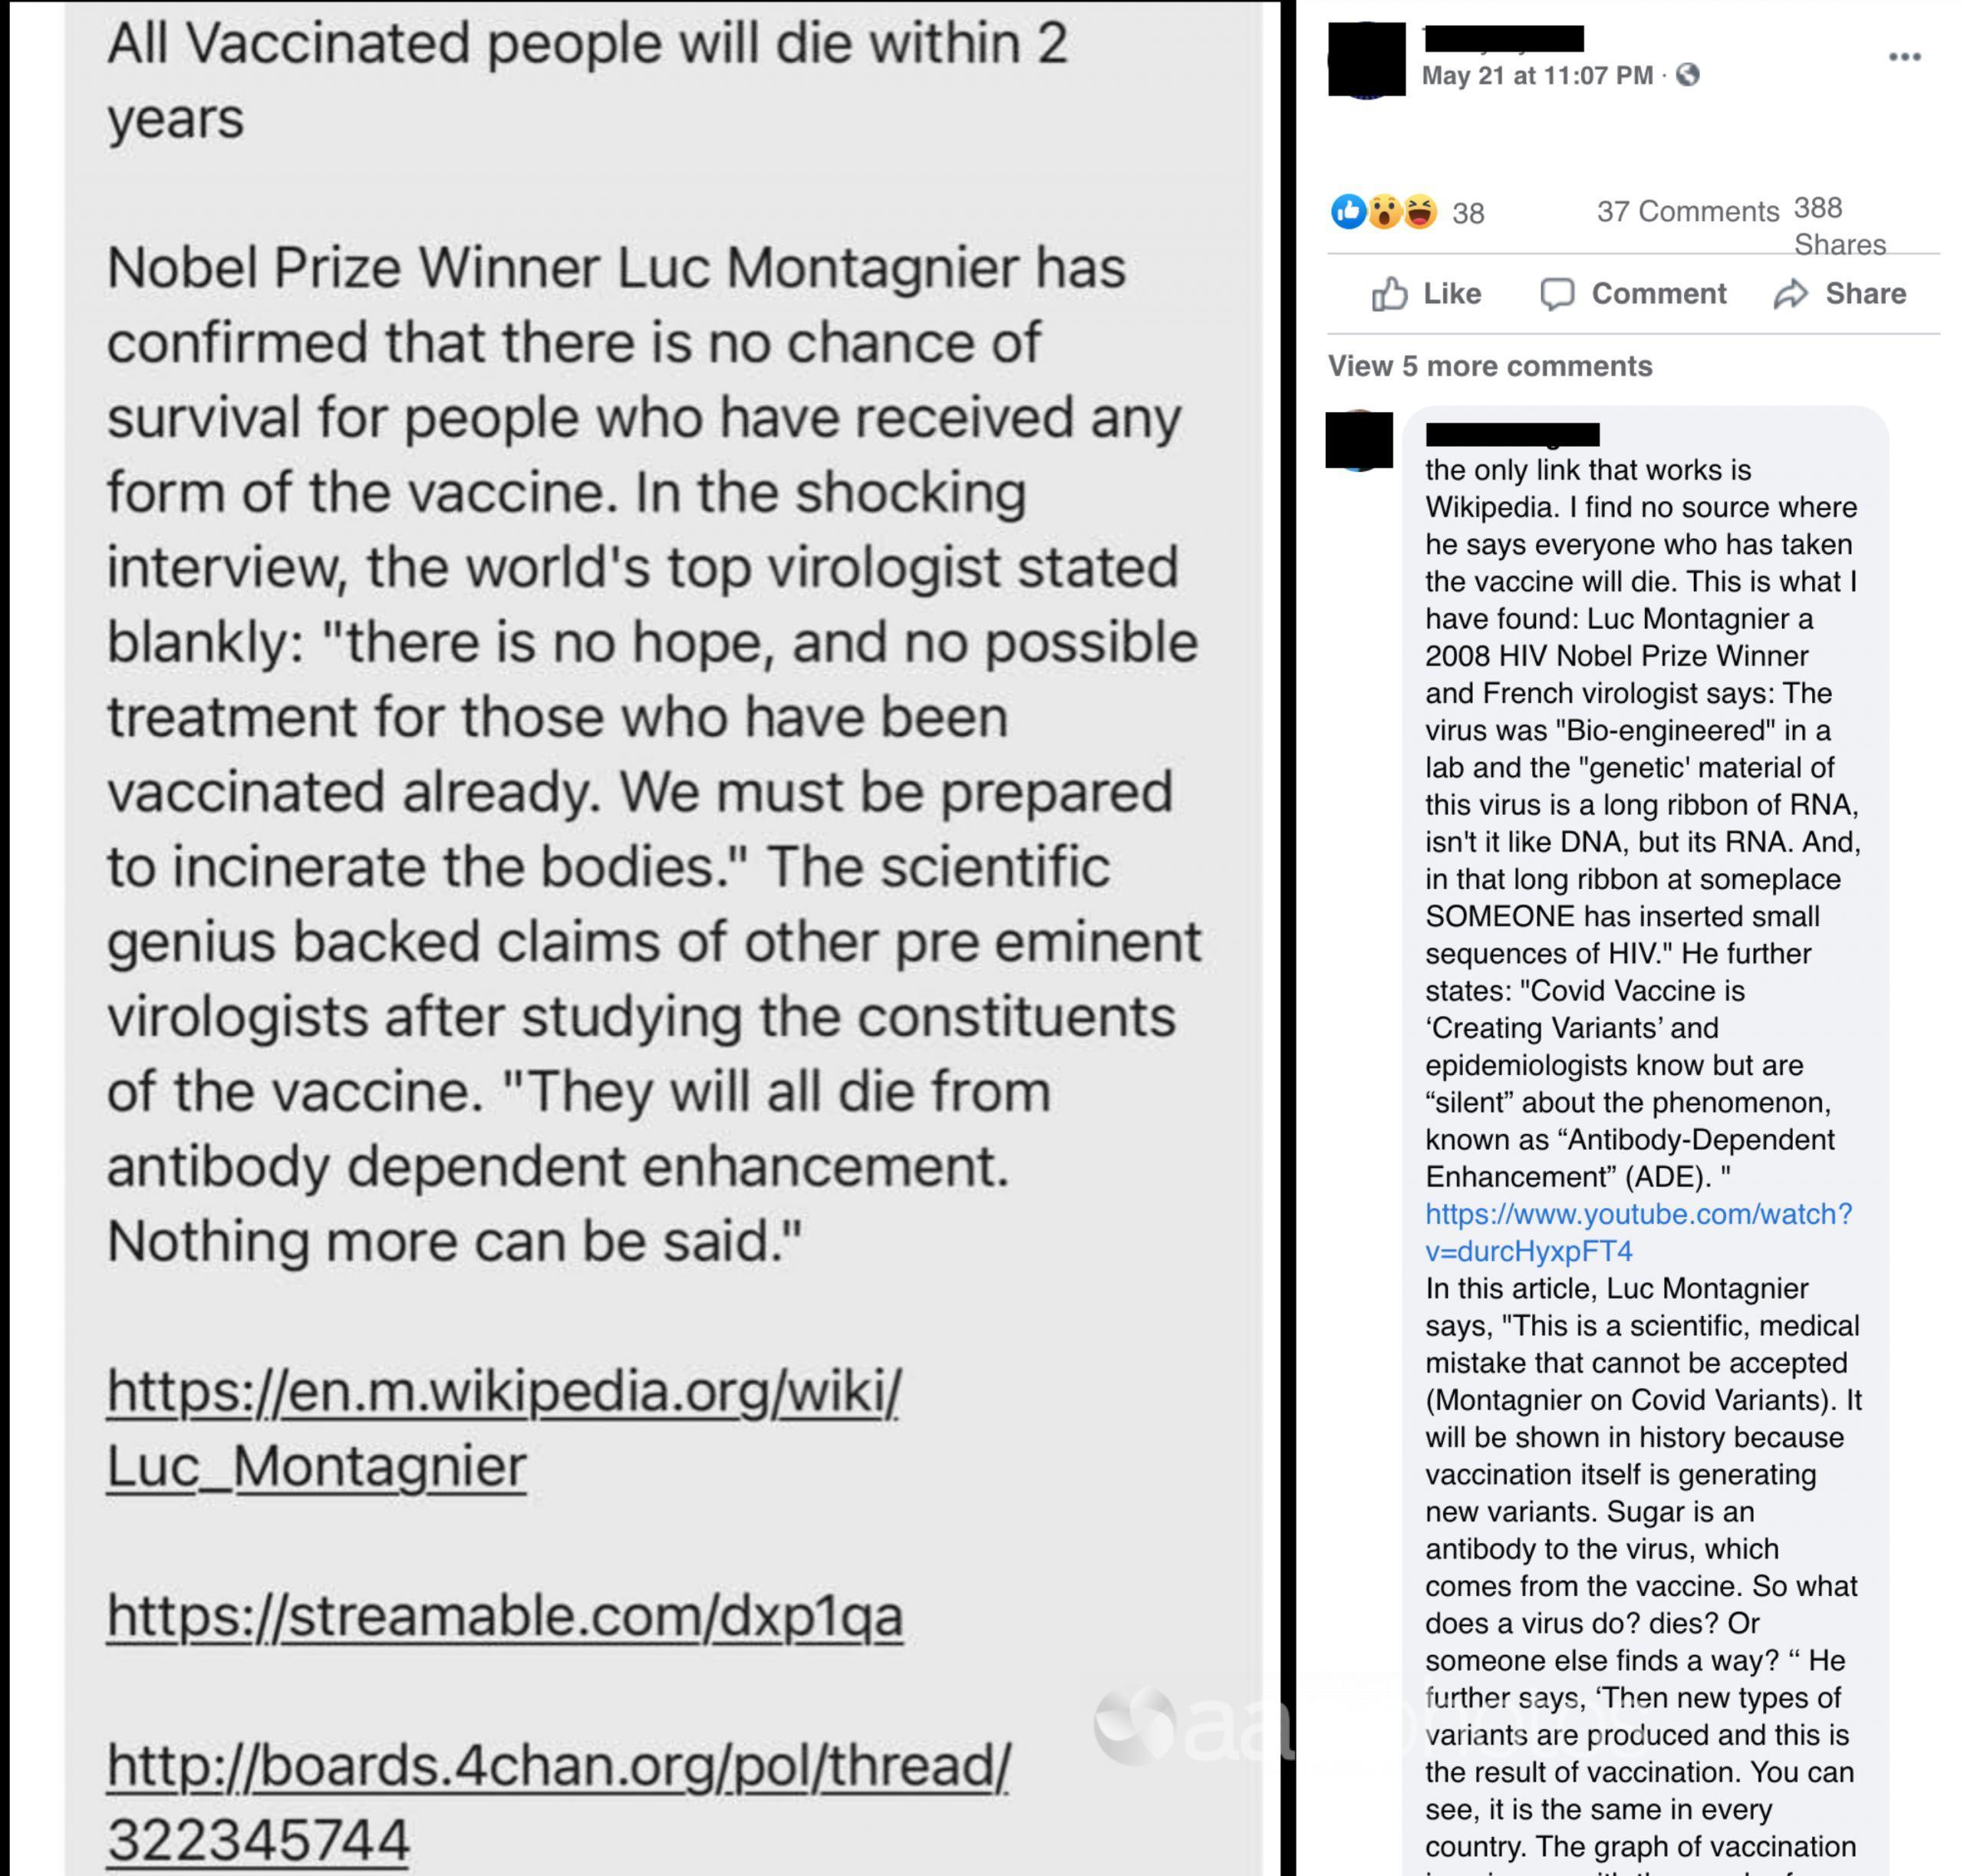 A Facebook post